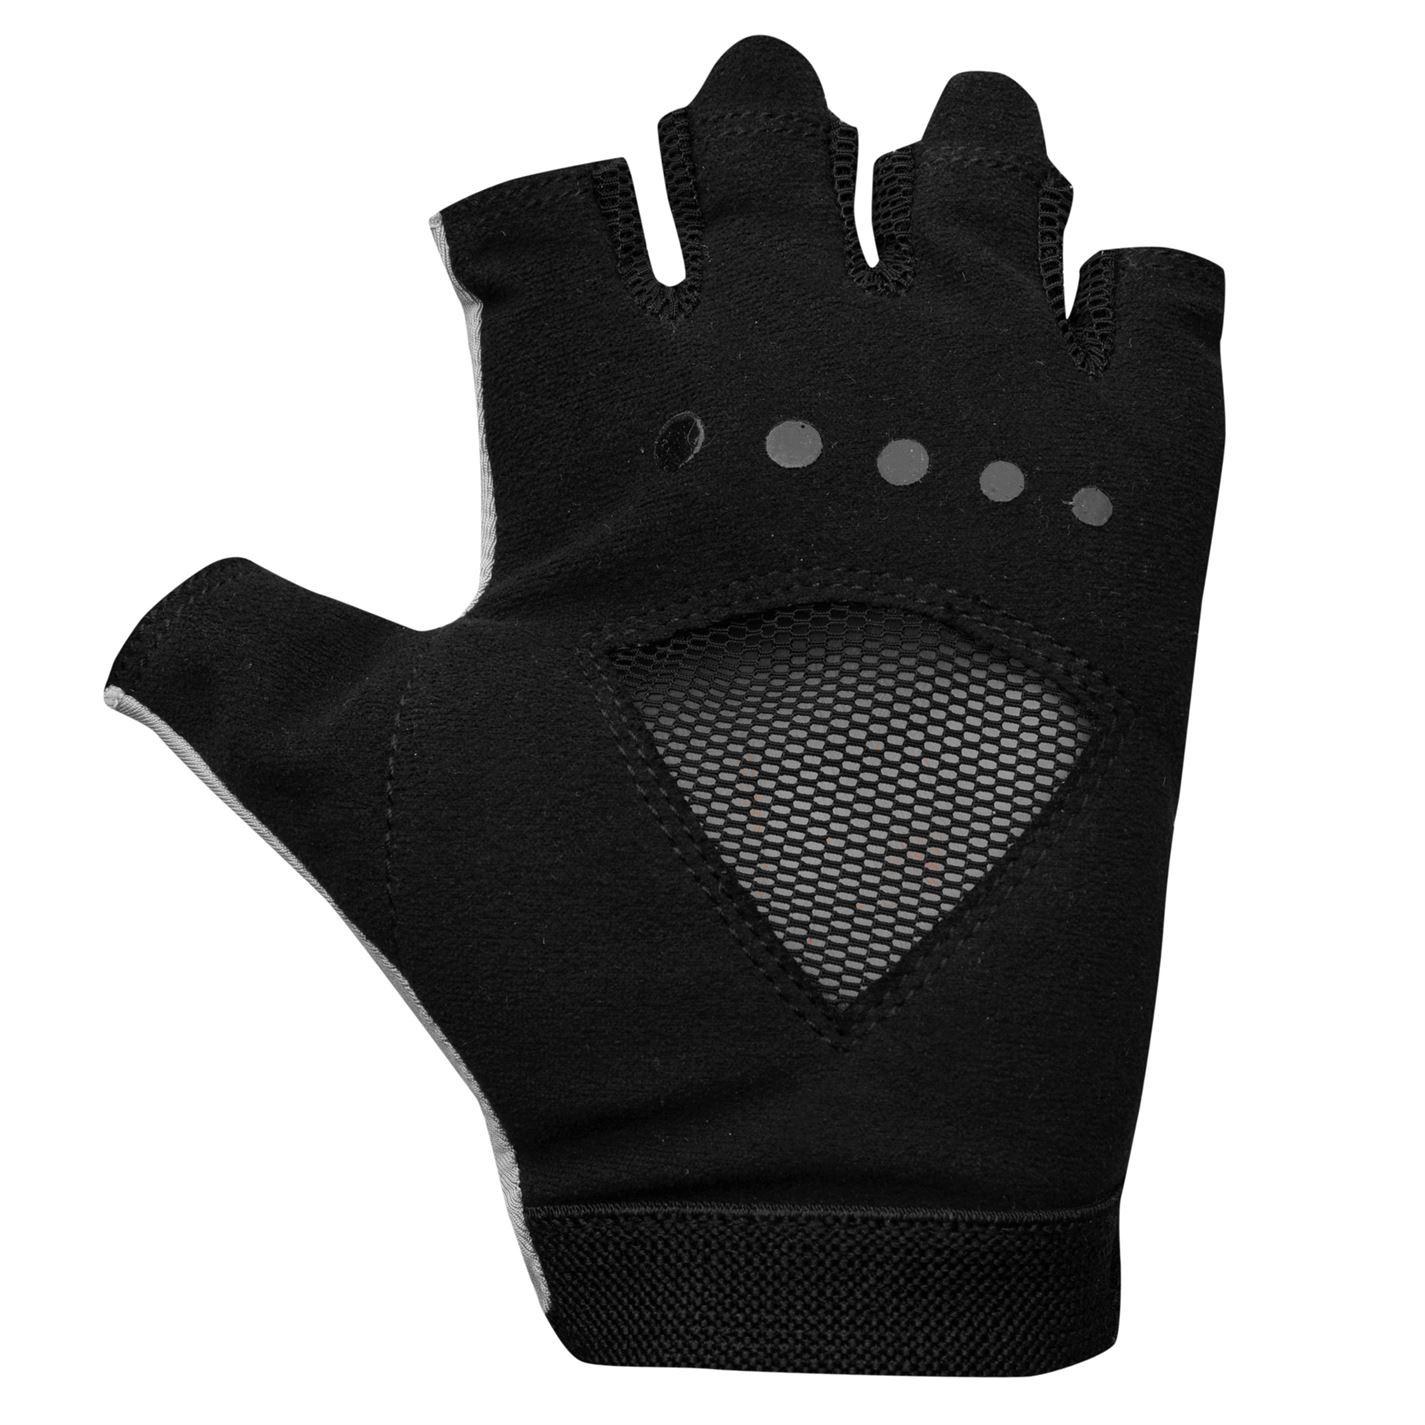 Mesh Weight Lifting Gloves: Puma Womens Gym Gloves Training Lightweight Mesh